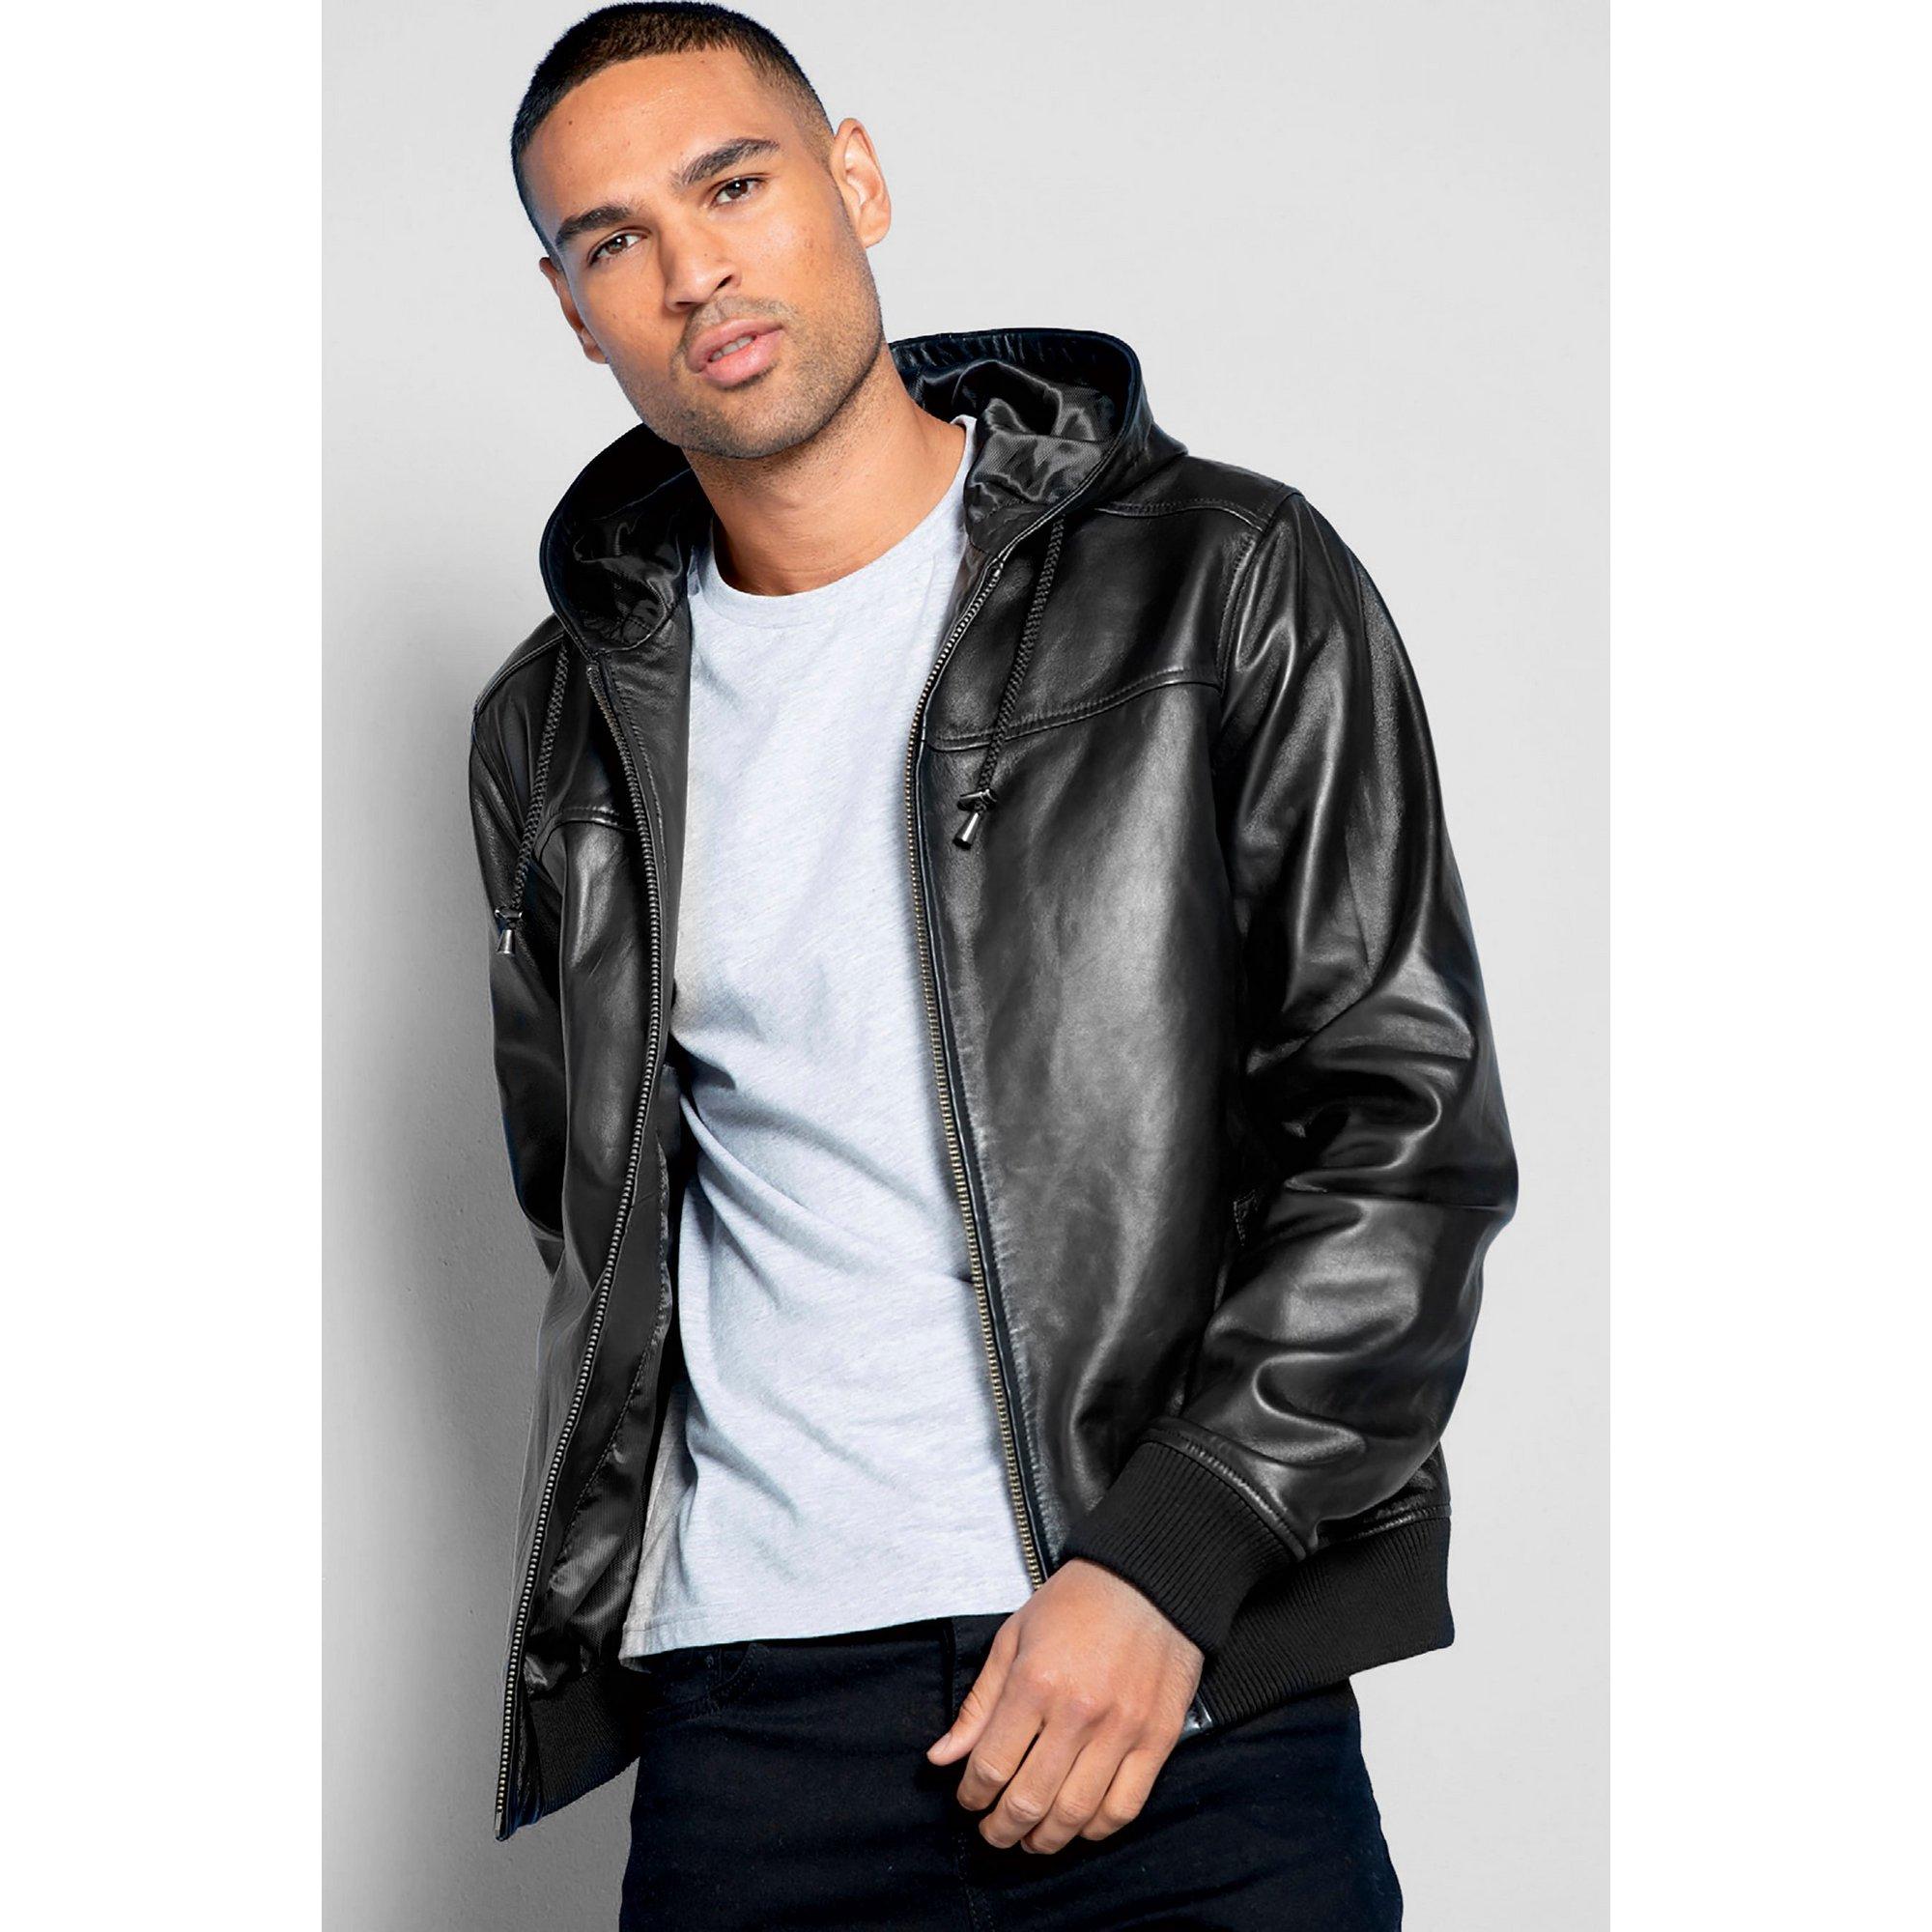 Image of Barneys Hooded Black Leather Jacket